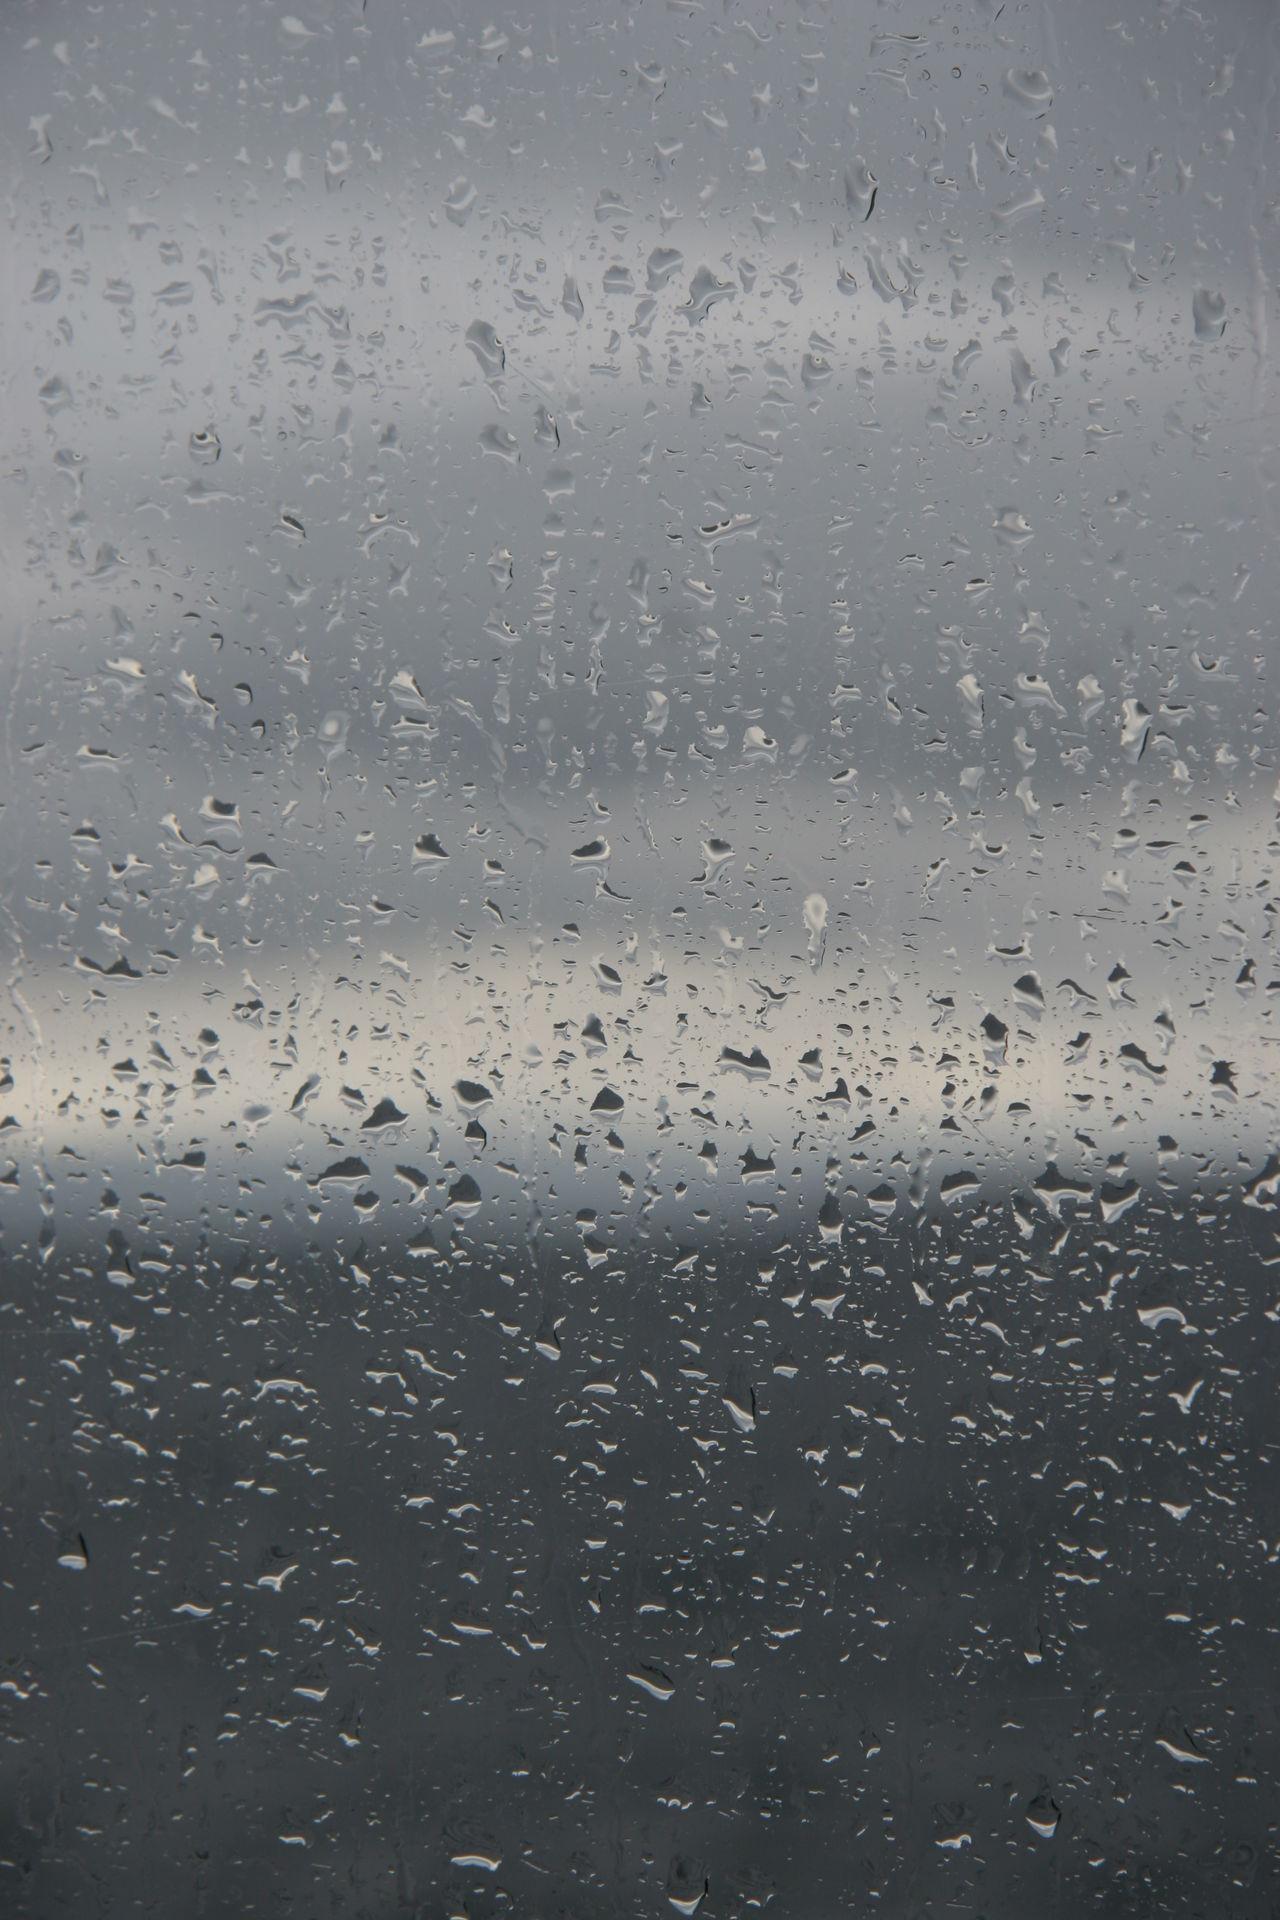 Backgrounds Close-up Day Drop Full Frame Glass - Material Indoors  Rain RainDrop Rainy Season Transparent Water Weather Wet Window